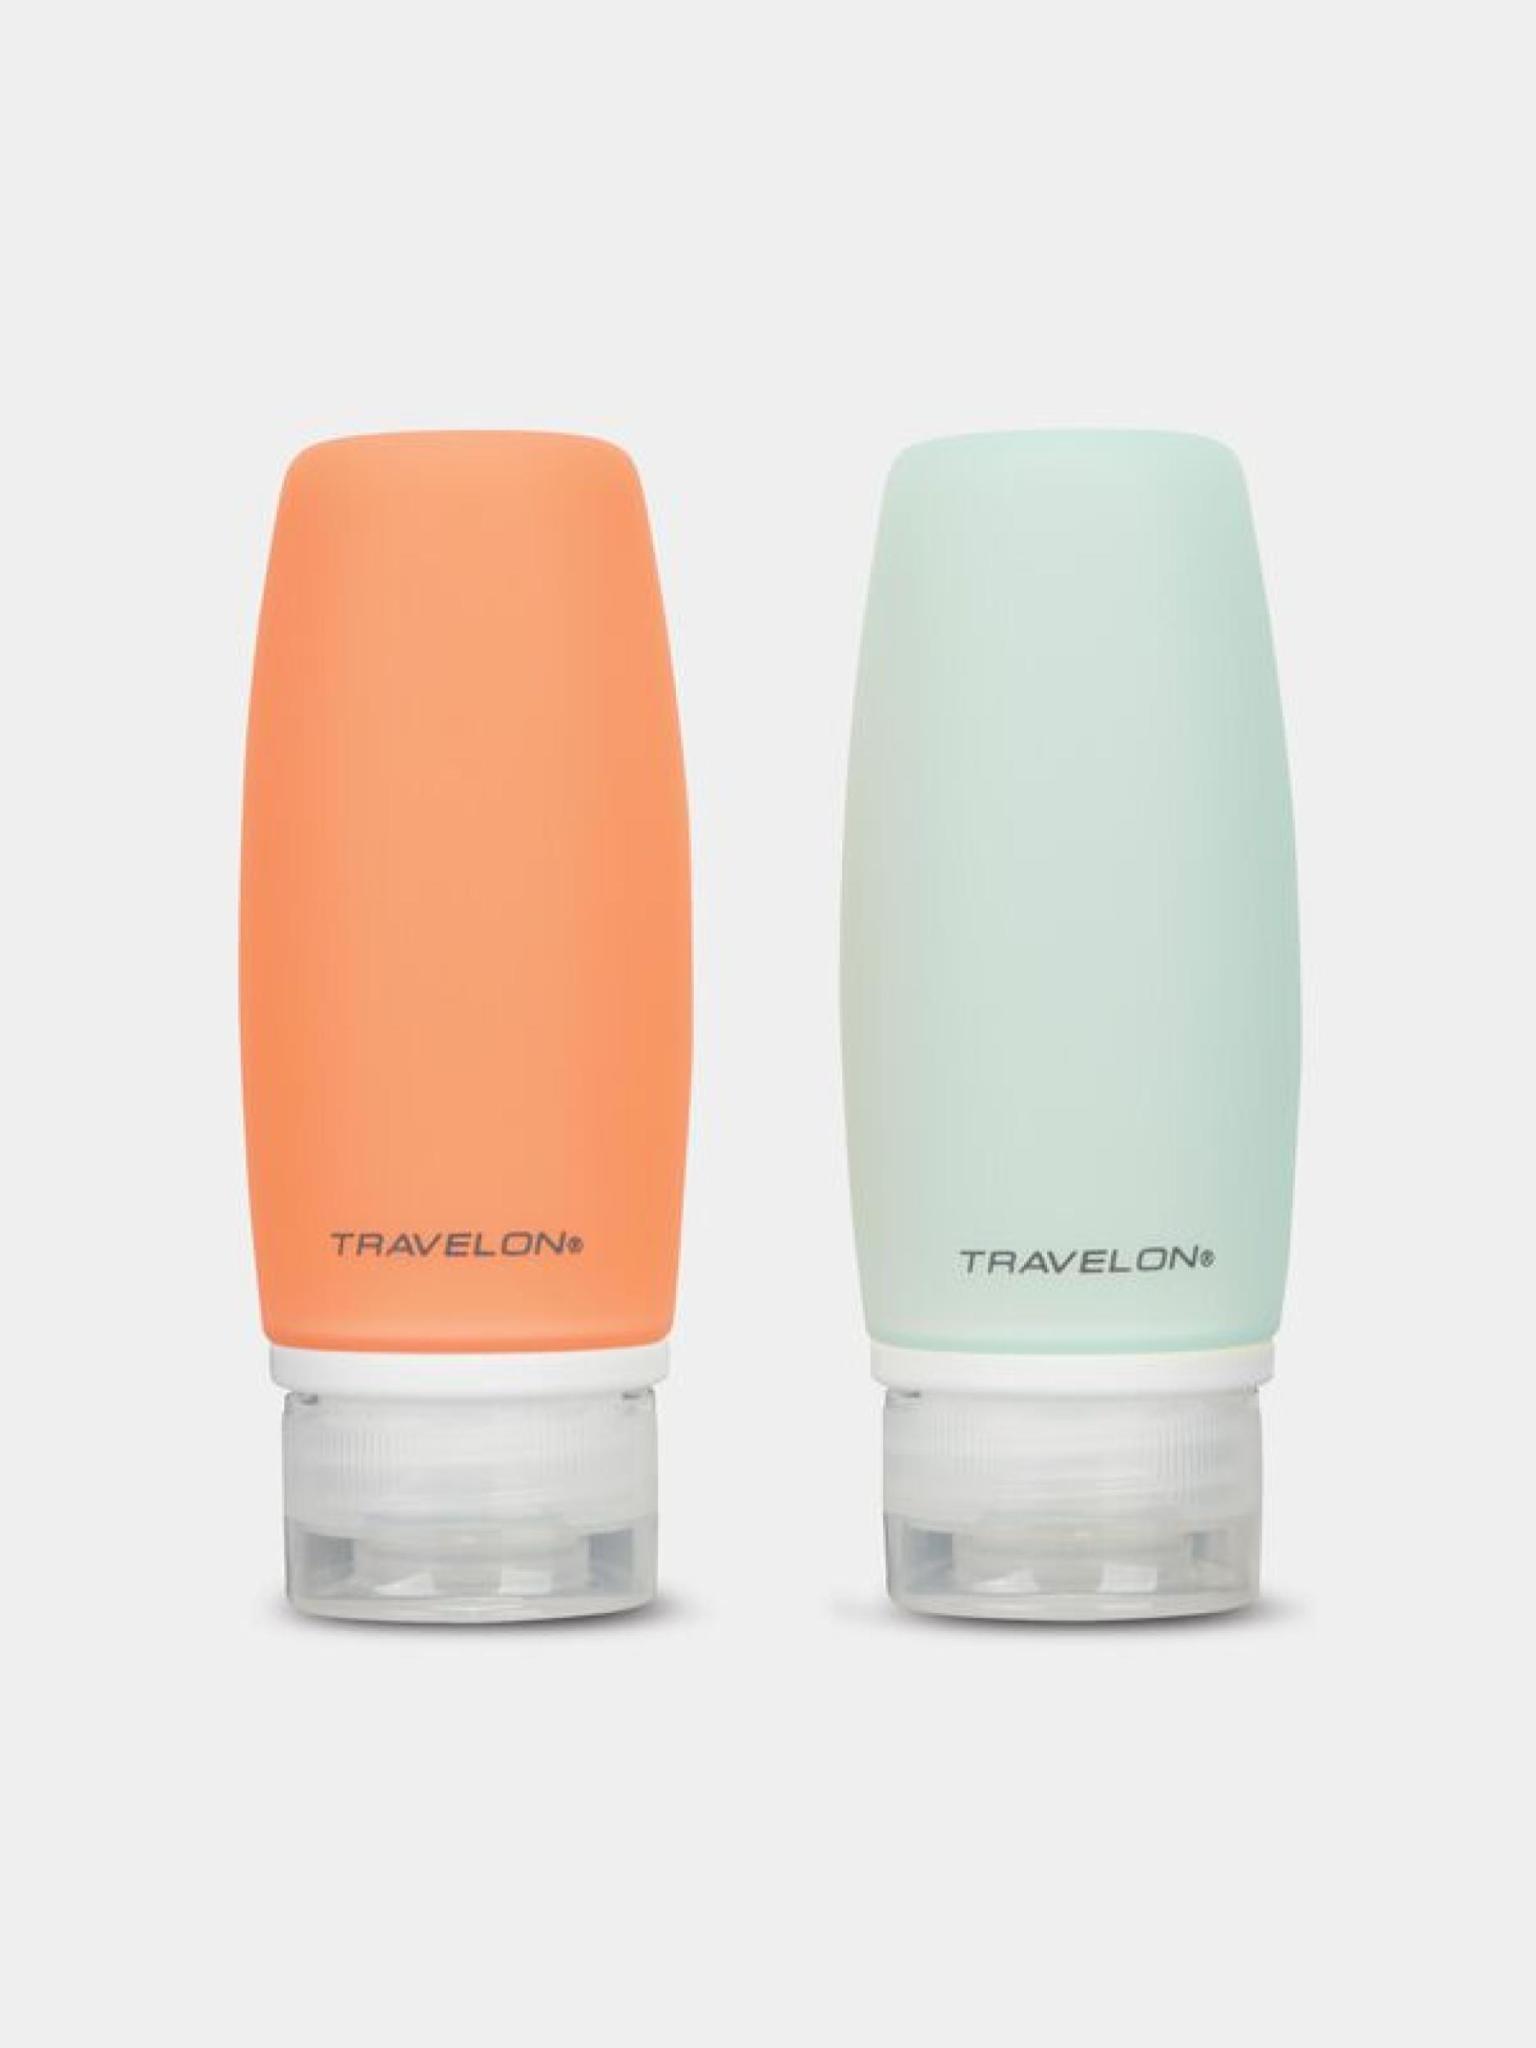 Travelon 3 oz Smart Tubes